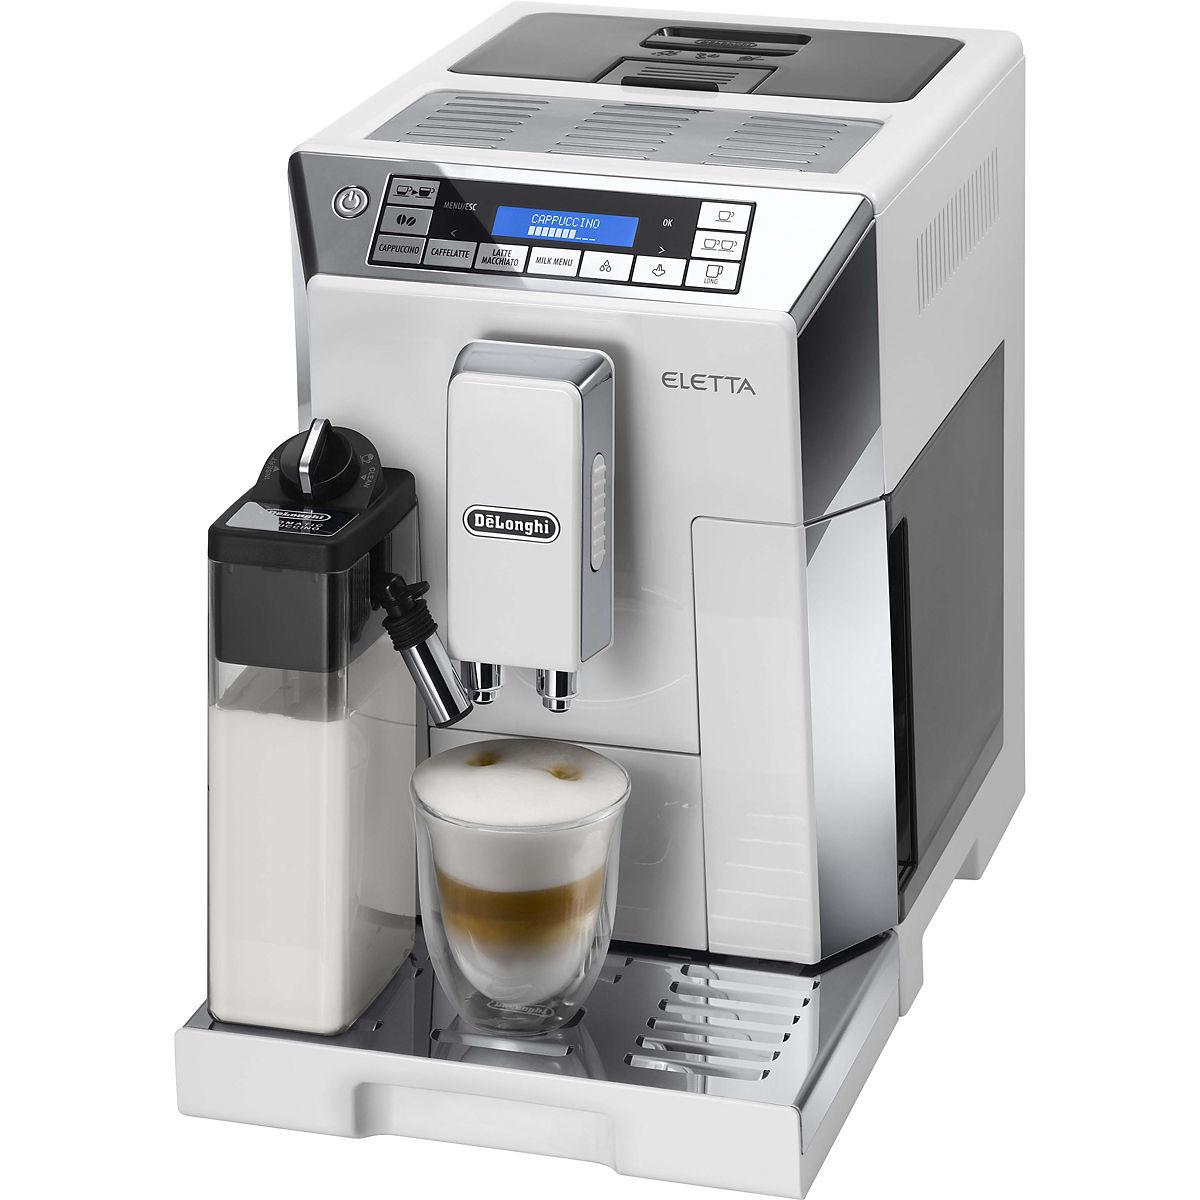 DeLonghi Kaffeevollautomat ECAM 45.766.W Eletta Cappuccino Weiß für 607,94€ [Karstadt]